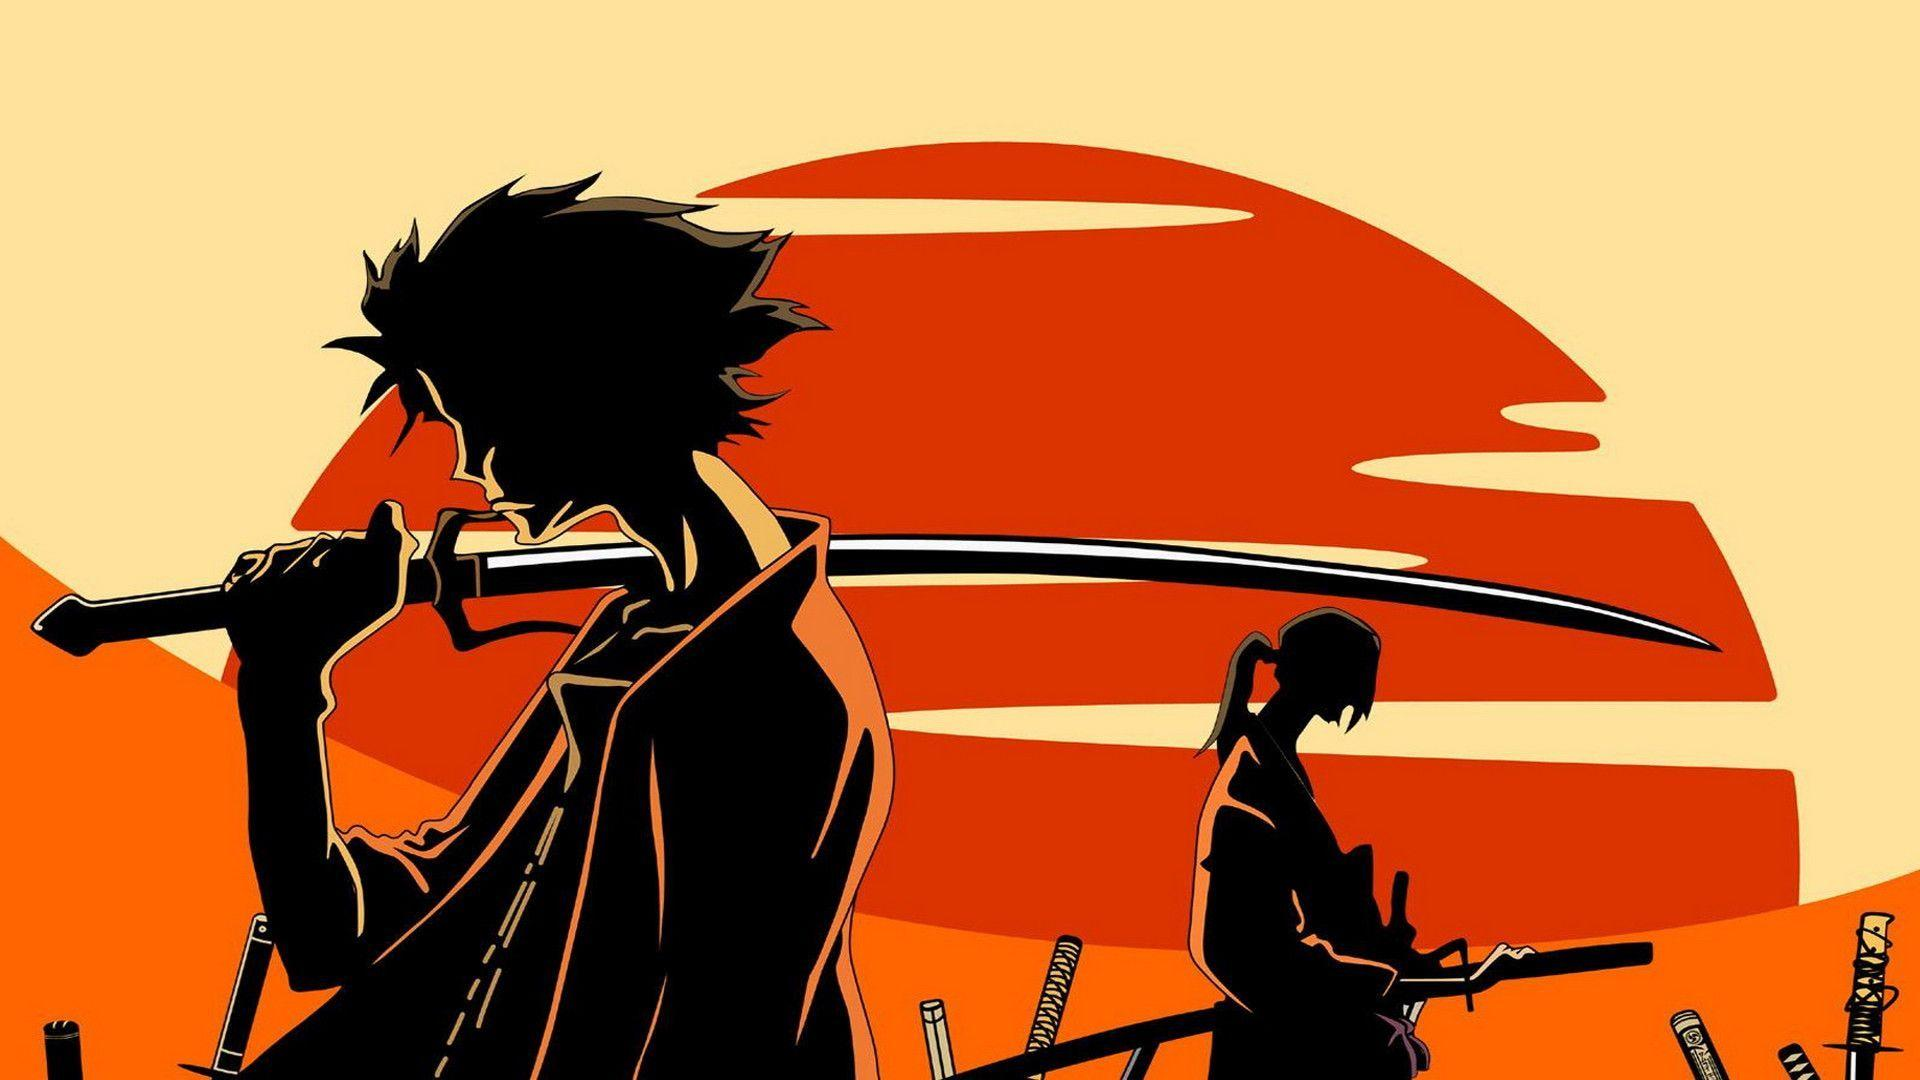 samurai champloo wallpaper tumblr